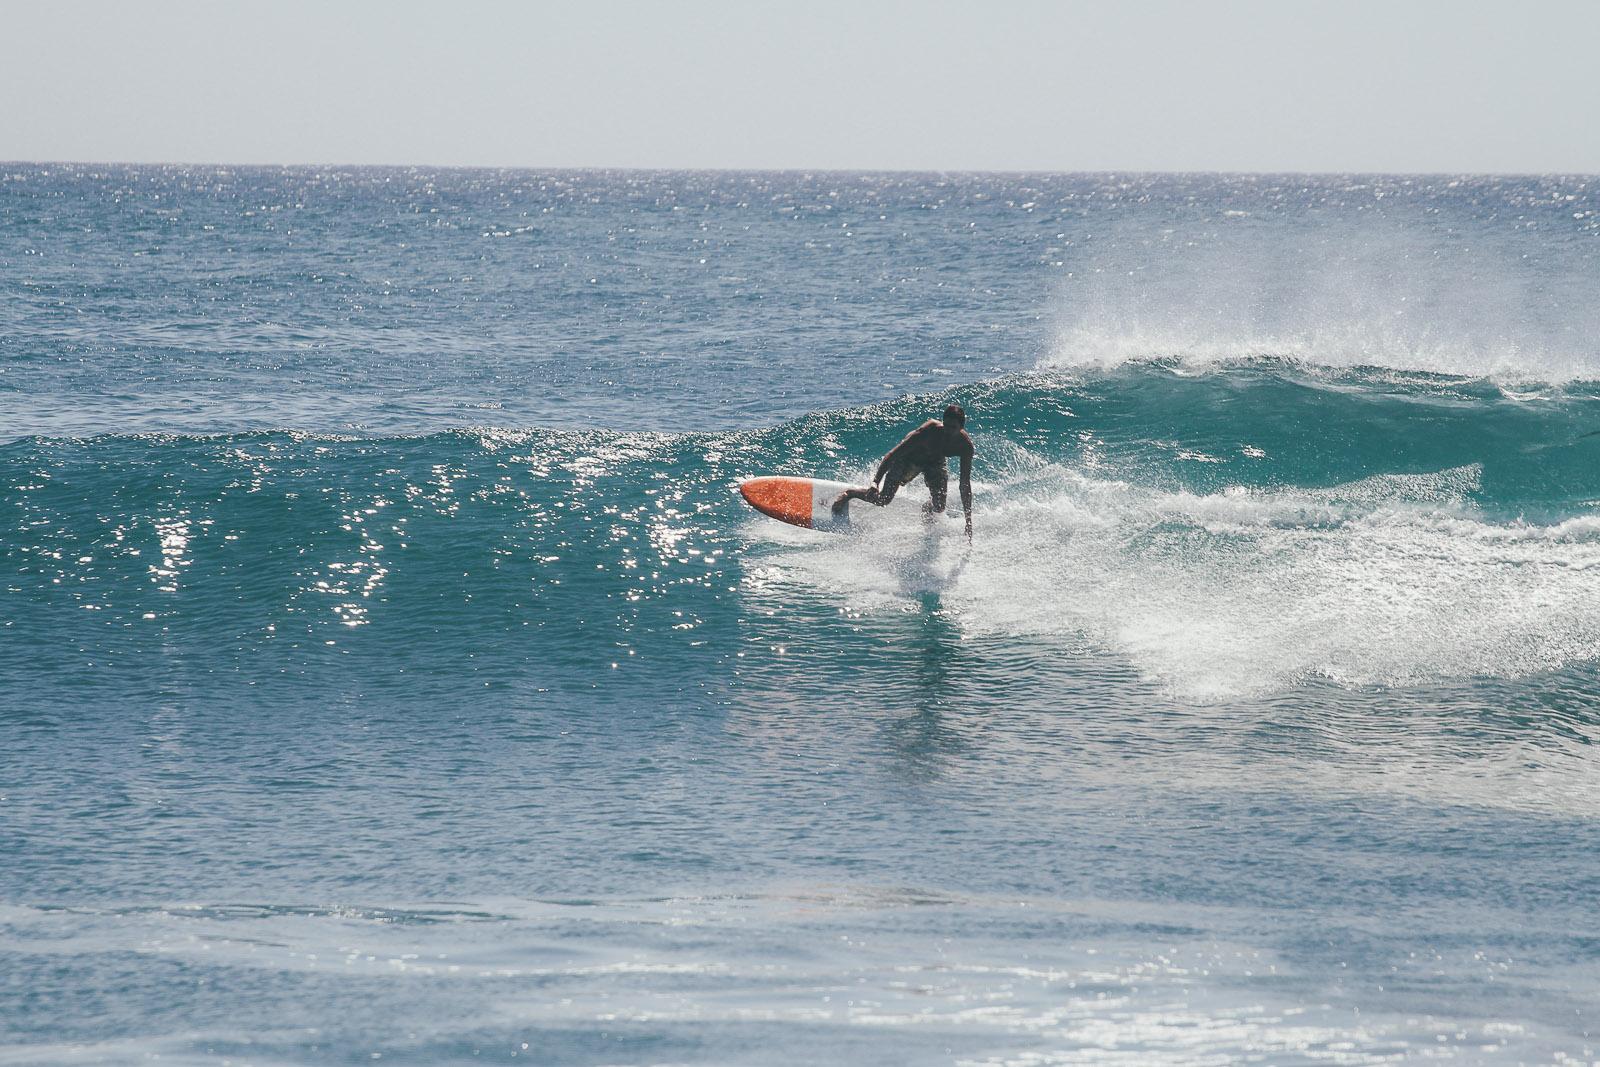 Sunshinestories-surf-travel-blog-IMG_7982